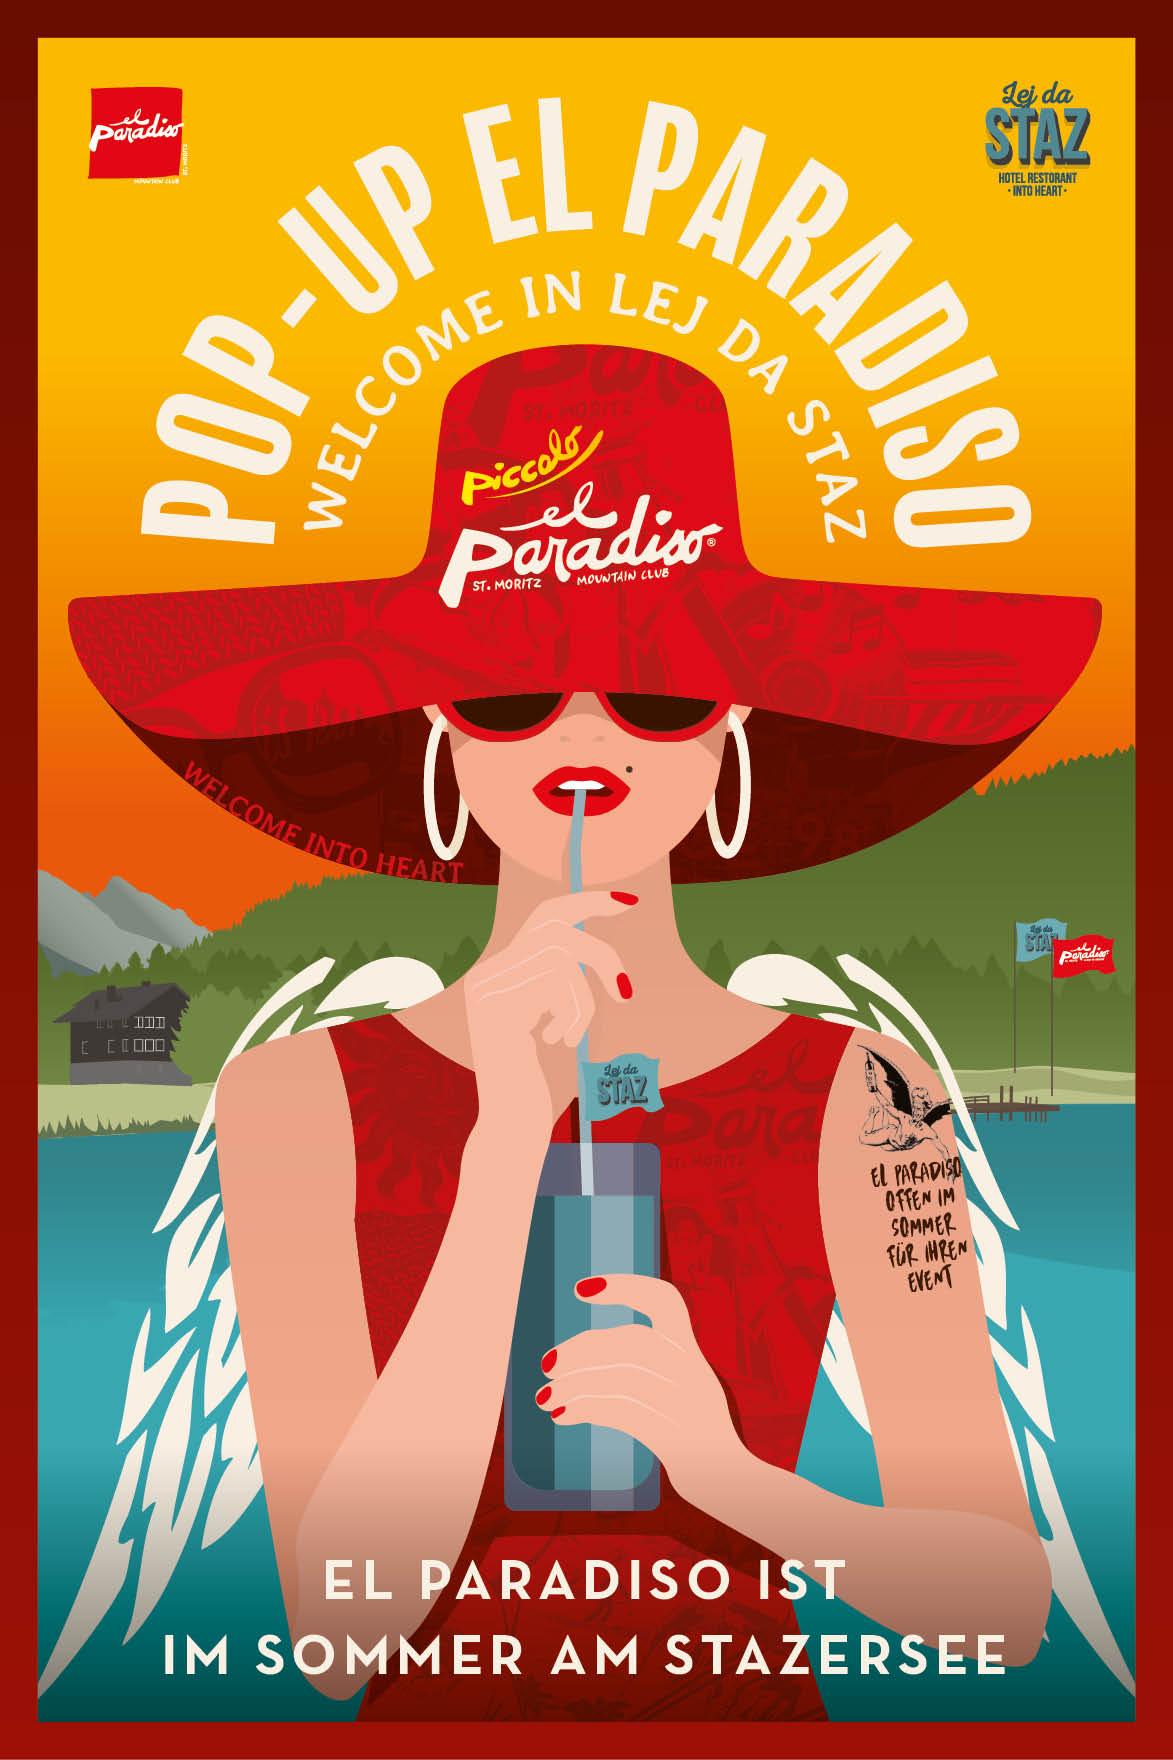 Pop-up-piccolo-elparadiso-stoerer-welcome.jpg